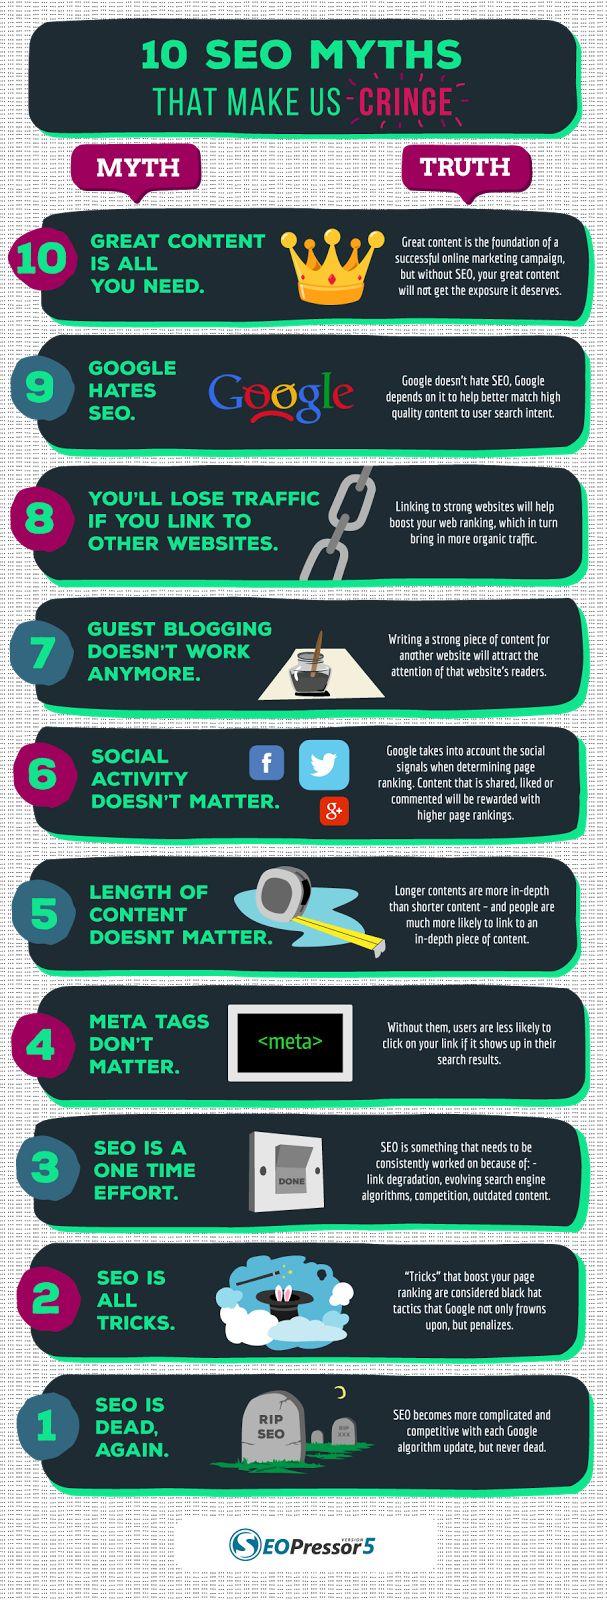 10 mythes! #SEO #Marketing #Web #Business #Entrepreneur #Startup #Content…